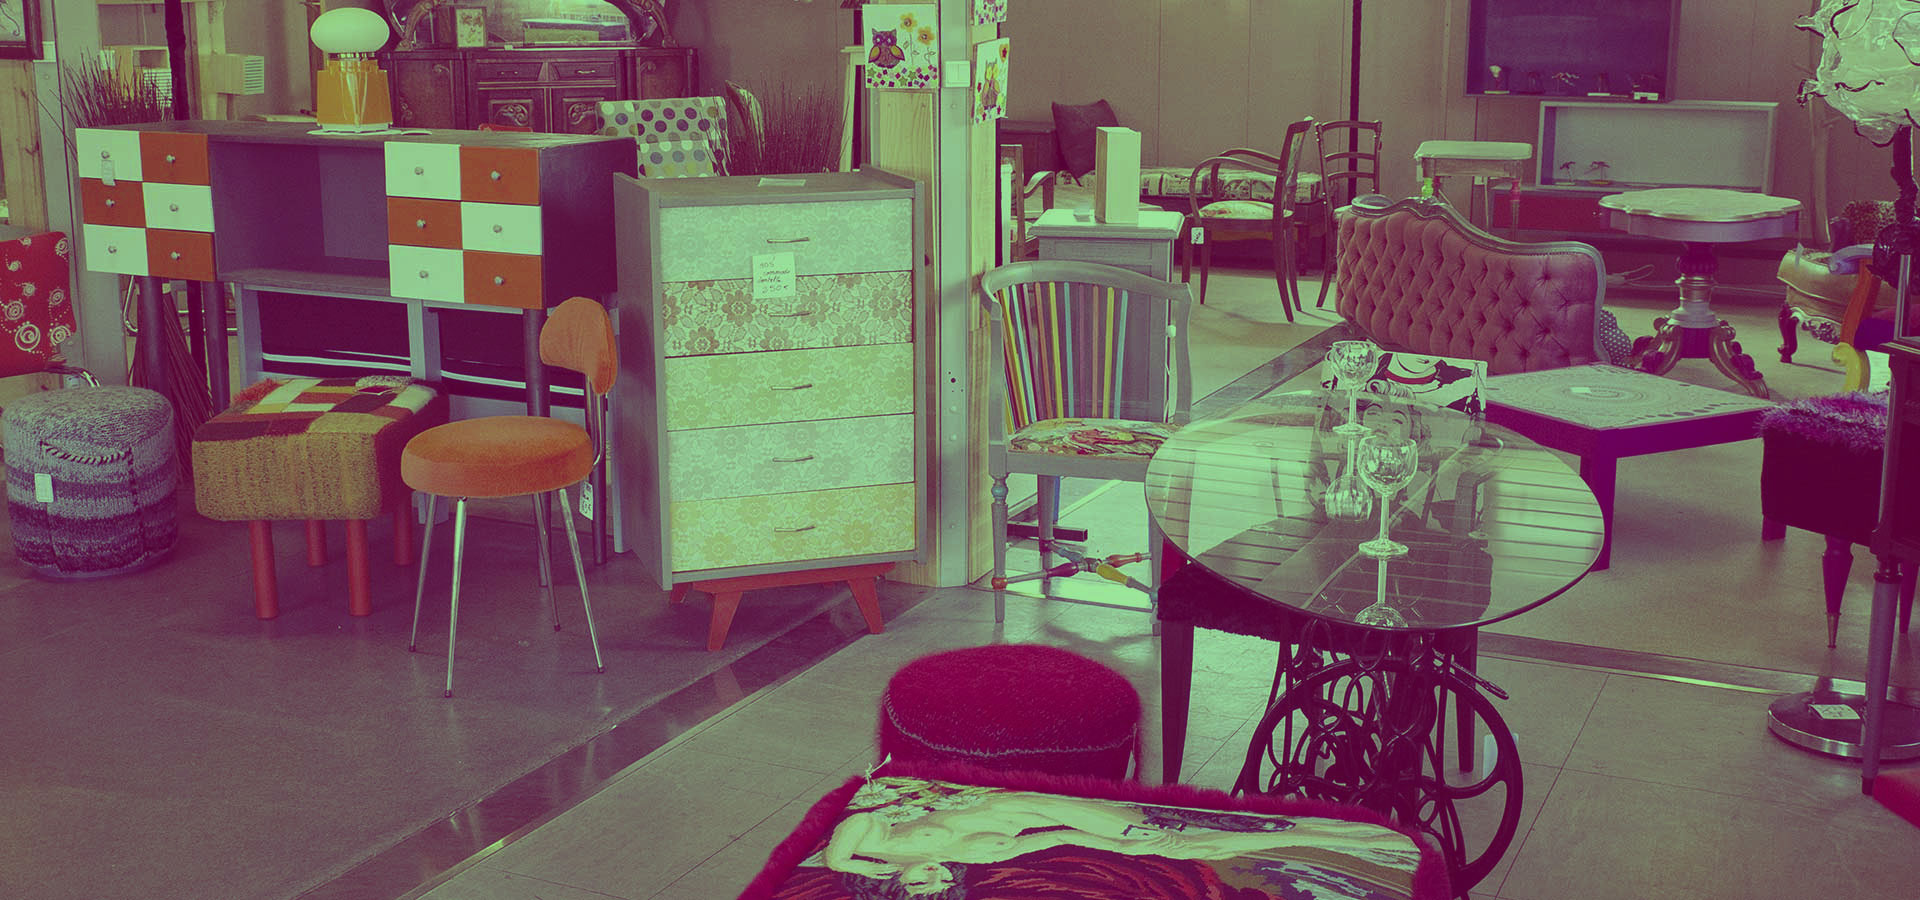 blog 08 11 15 atelier d co solidaire. Black Bedroom Furniture Sets. Home Design Ideas